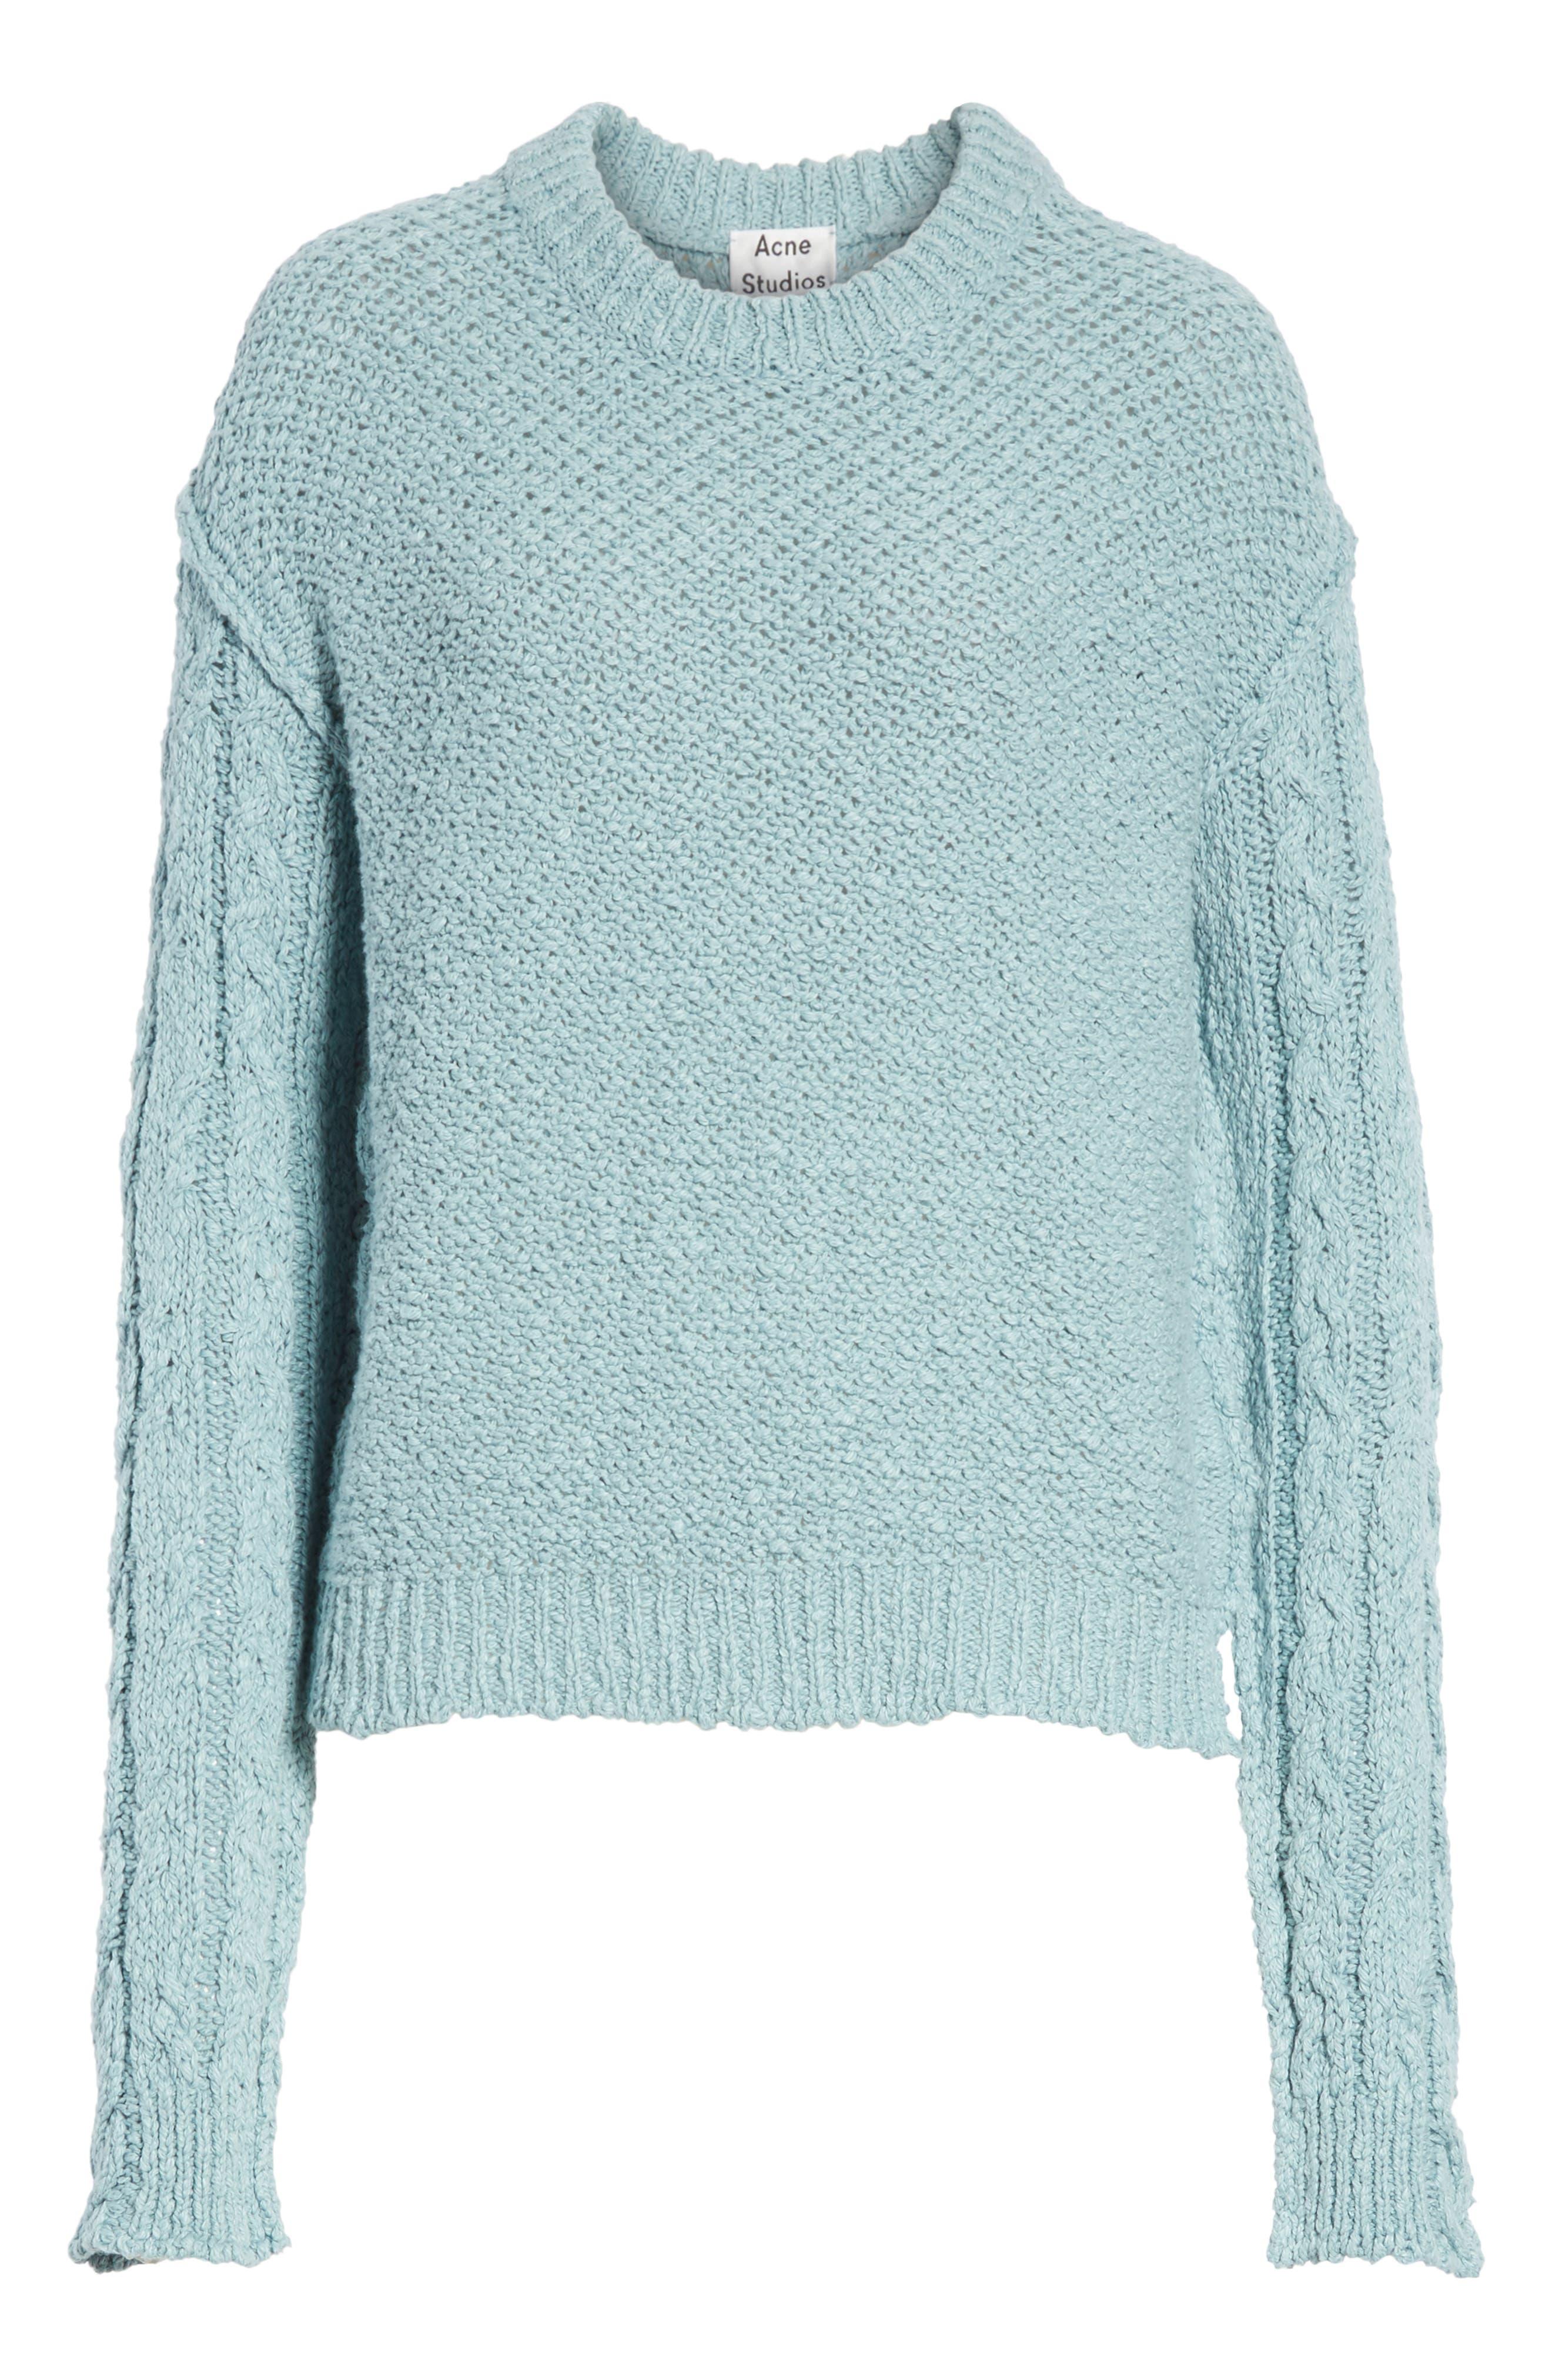 Main Image - Acne Studios Hila Cable Sleeve Sweater